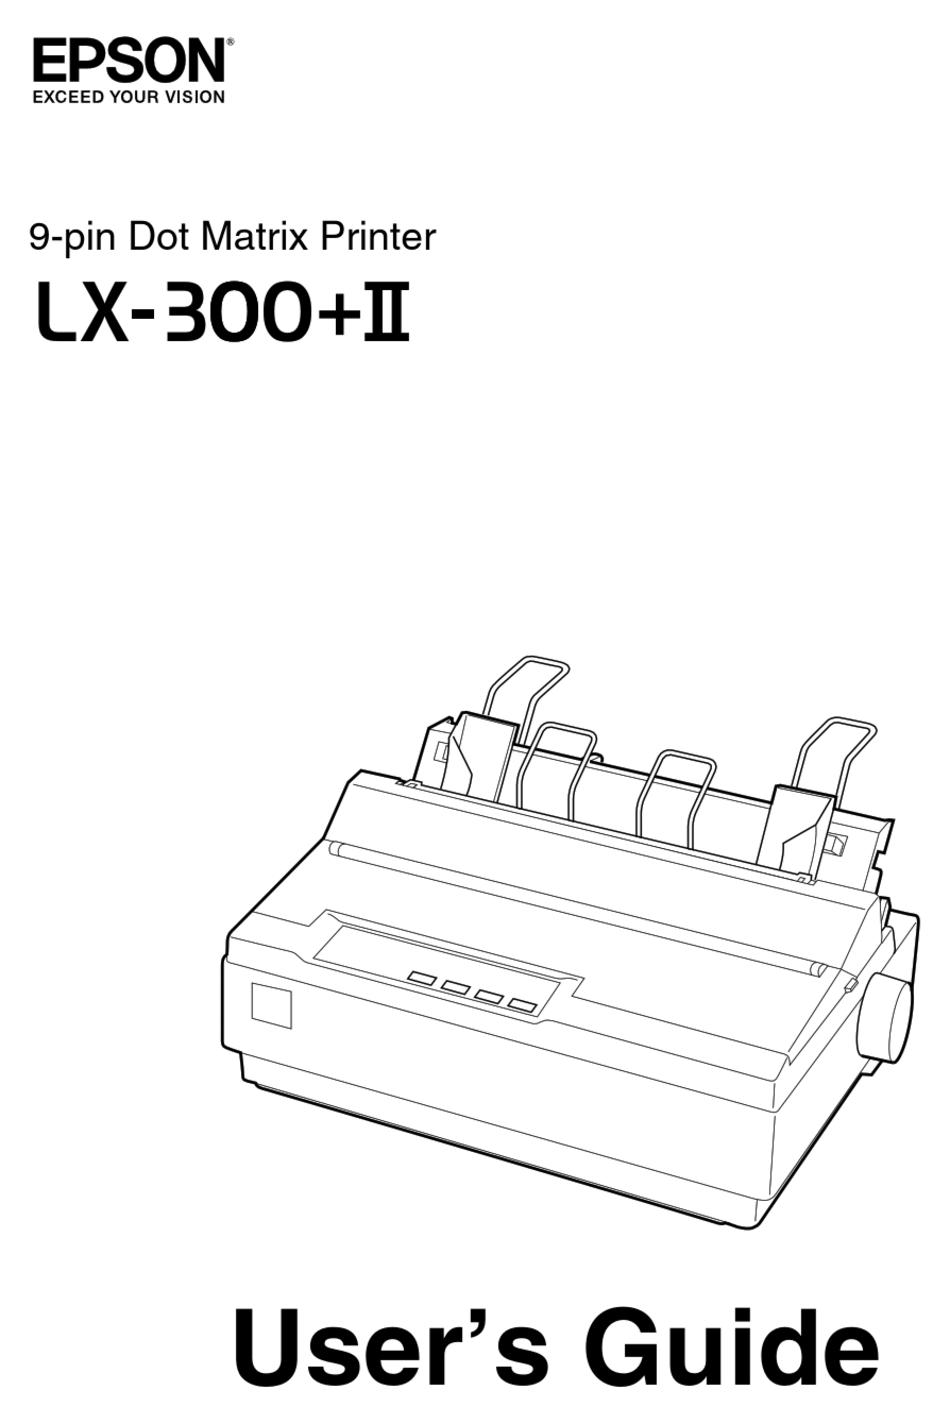 Epson Lx 300 Ii User Manual Pdf Download Manualslib